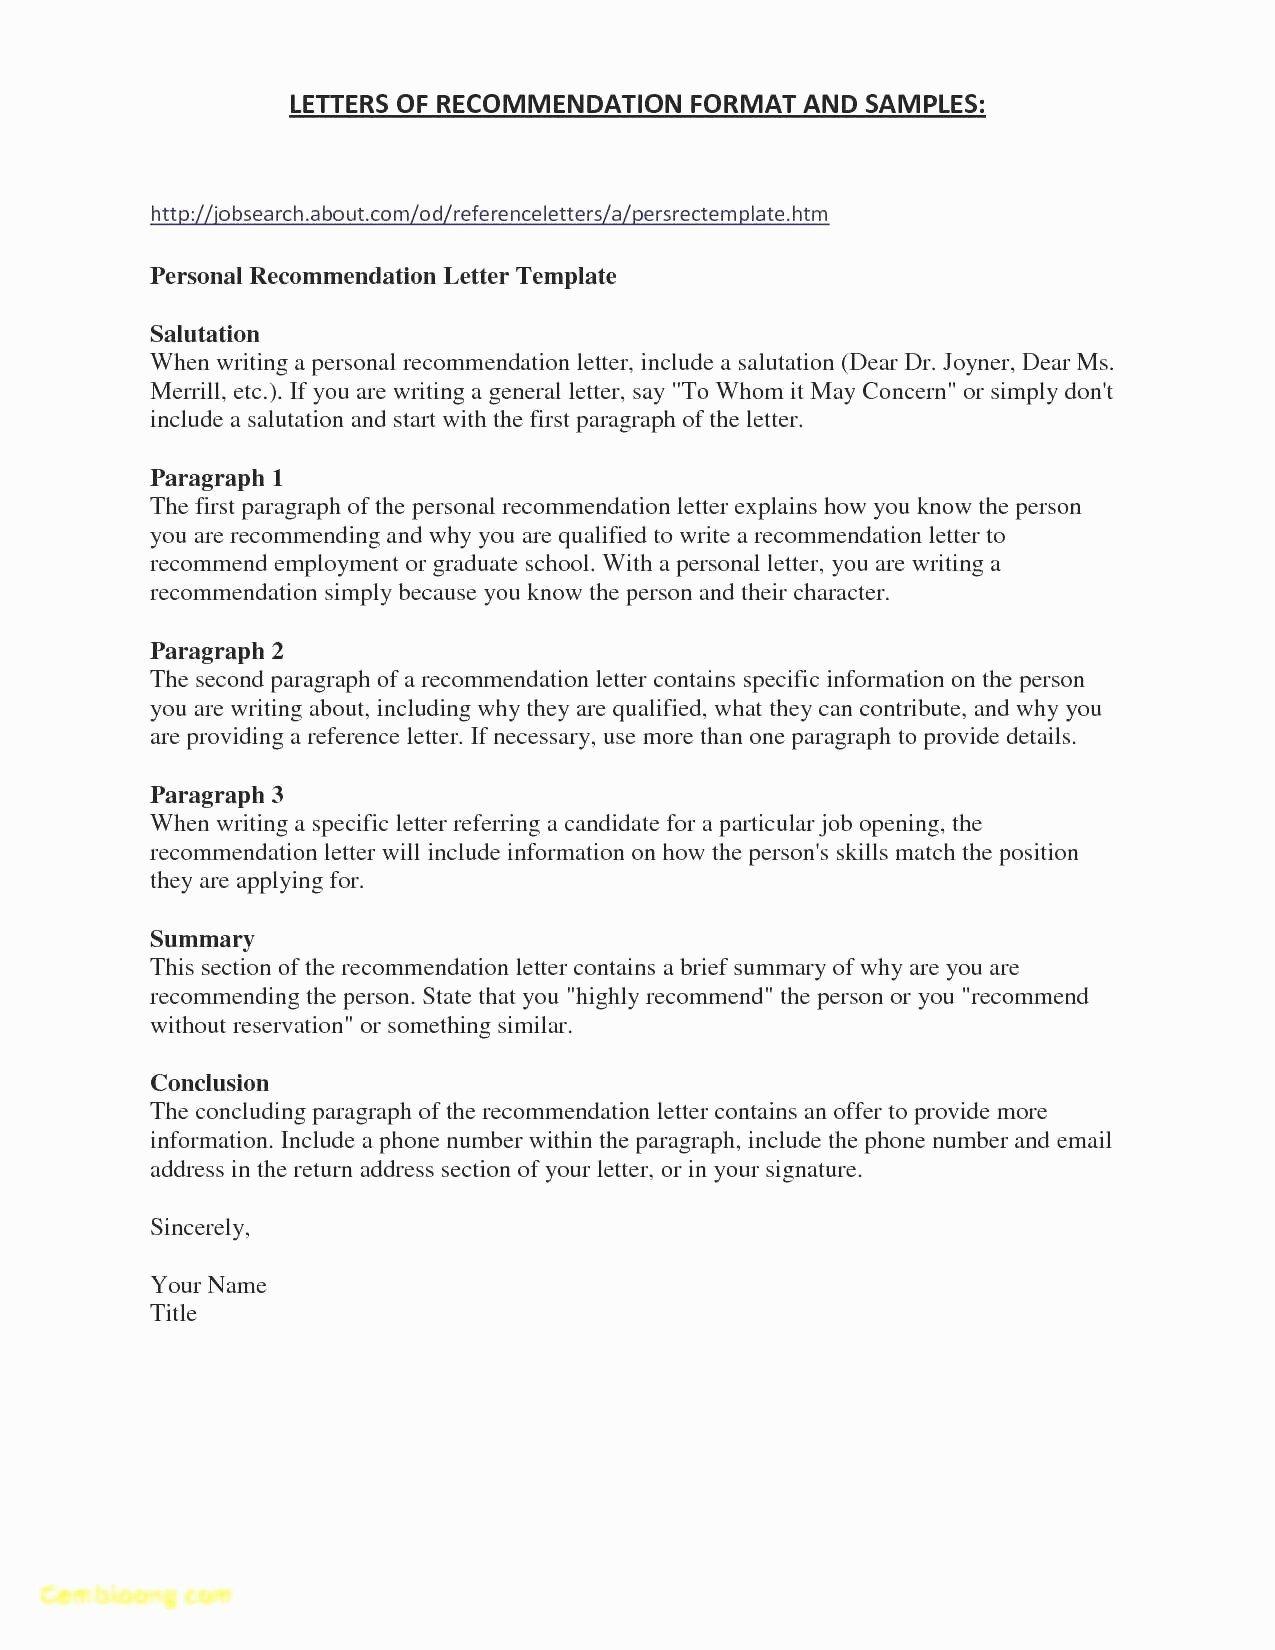 Letter Of Recommendation Etiquette Fresh Valid Letter Writing Etiquette sincerely